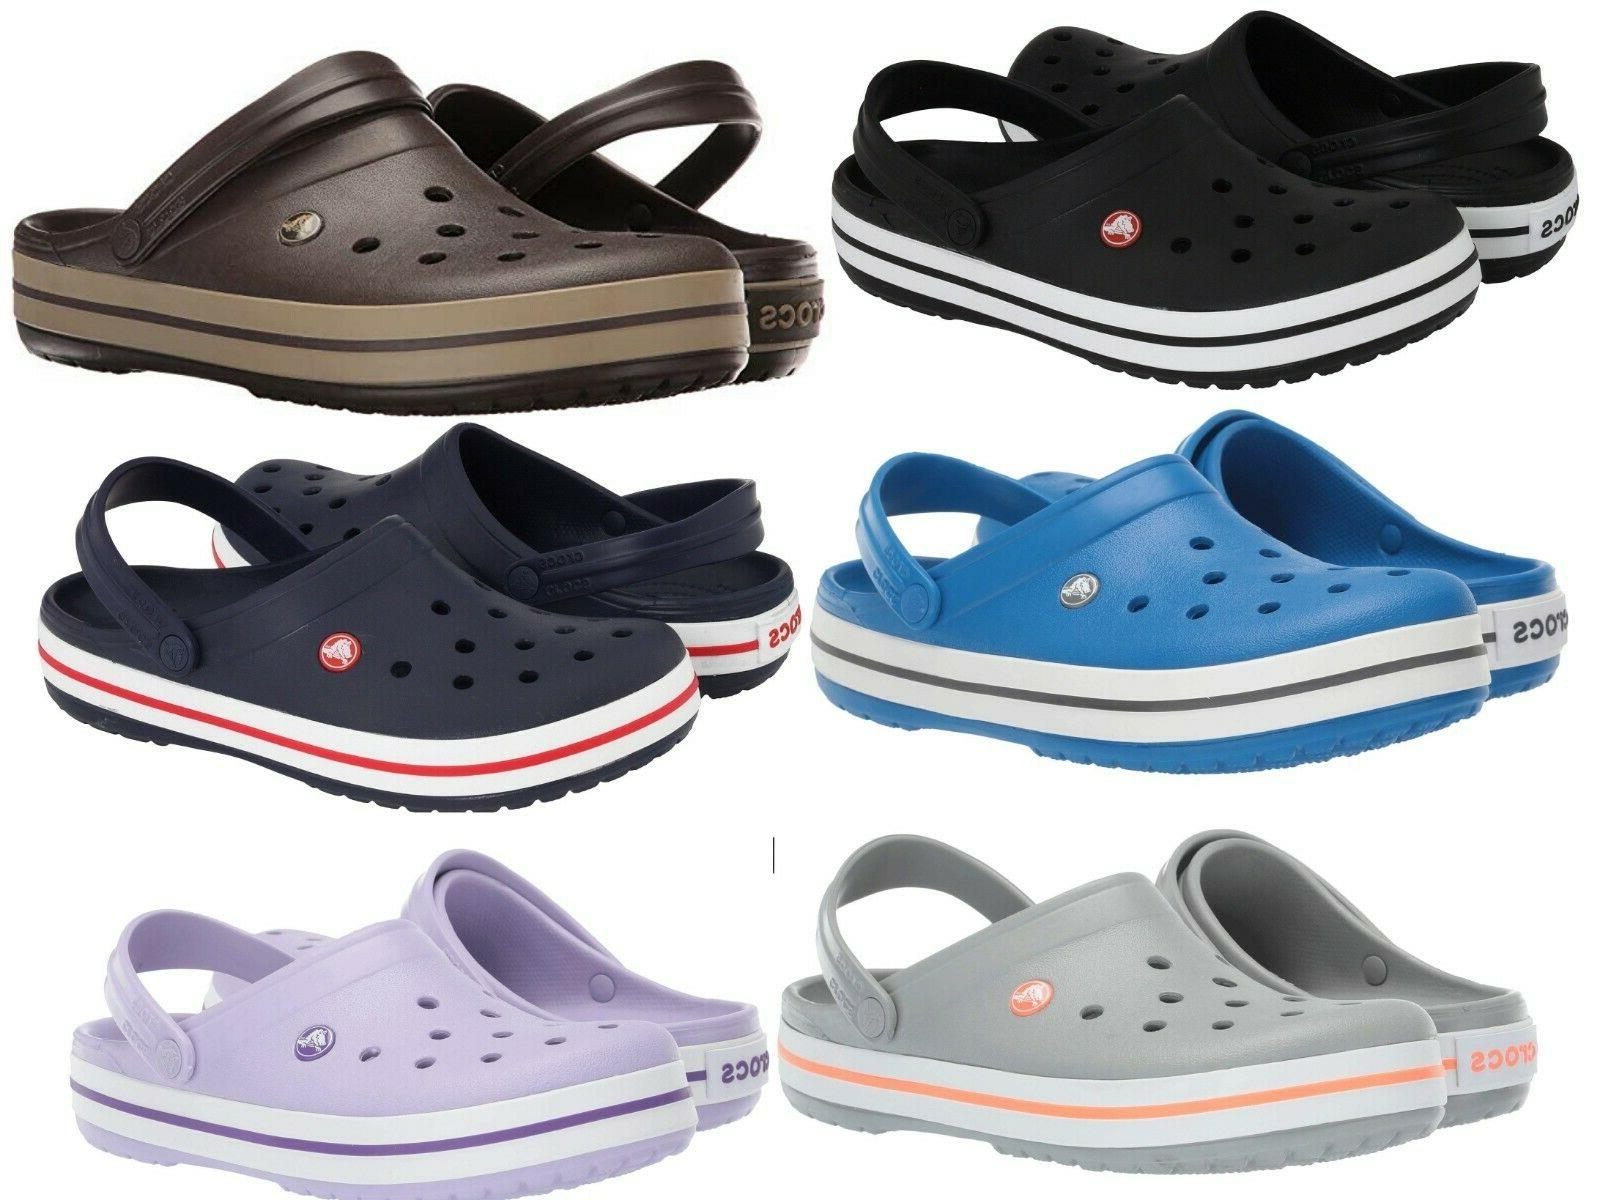 crocband clog unisex sandals ultralight foam slippers